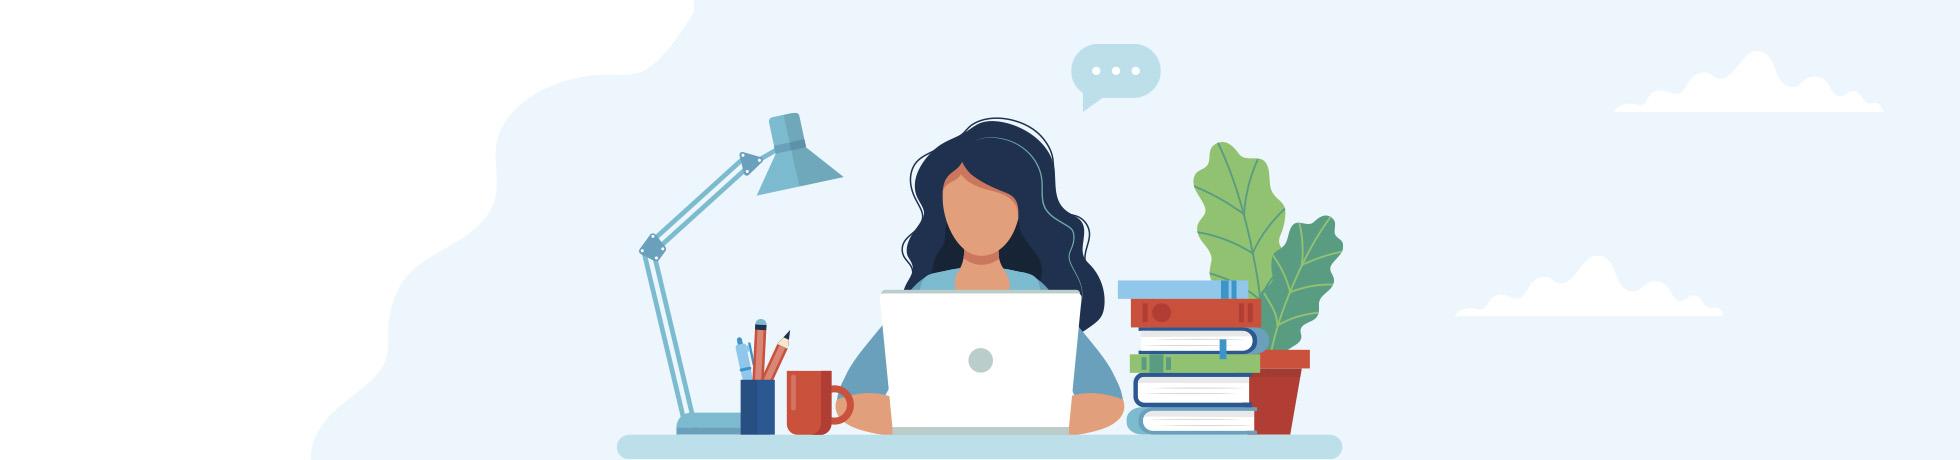 HR Workshops & Courses_Cover Image